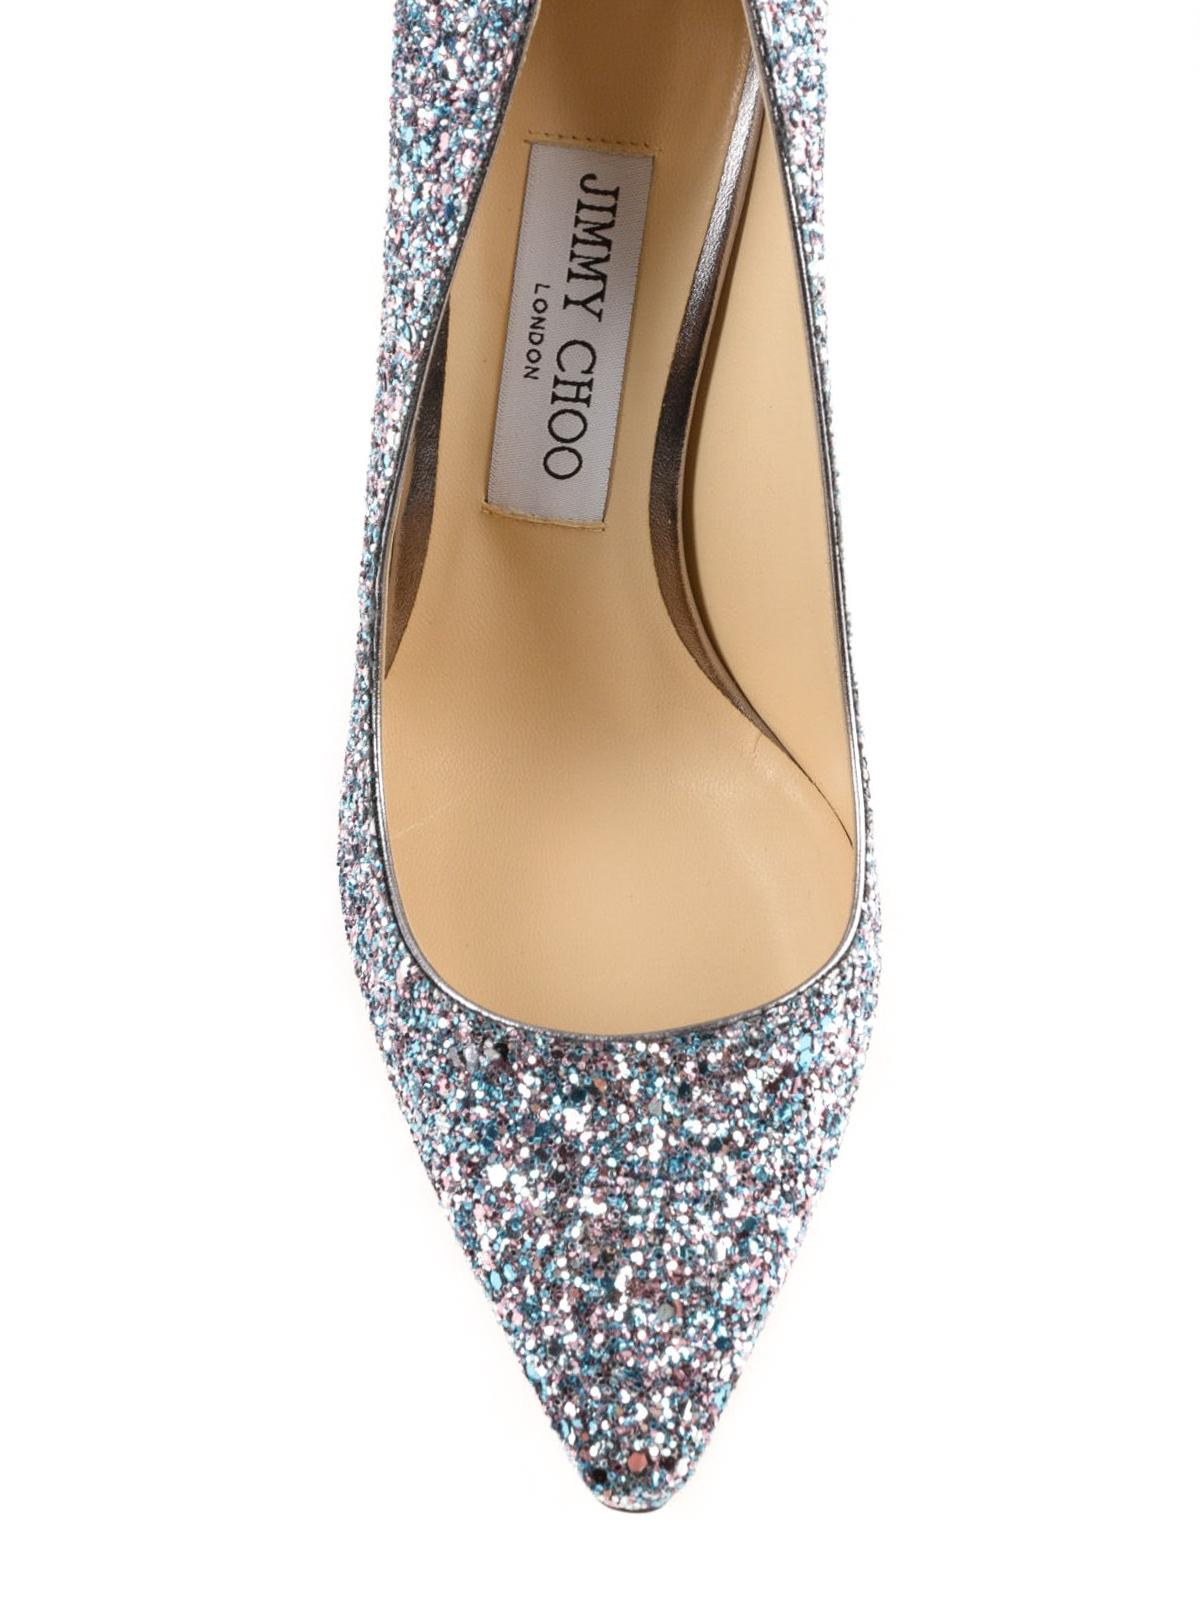 dcbde6ee89e5 Jimmy Choo - Romy coarse glitzy glitter pumps - court shoes - ROMY ...